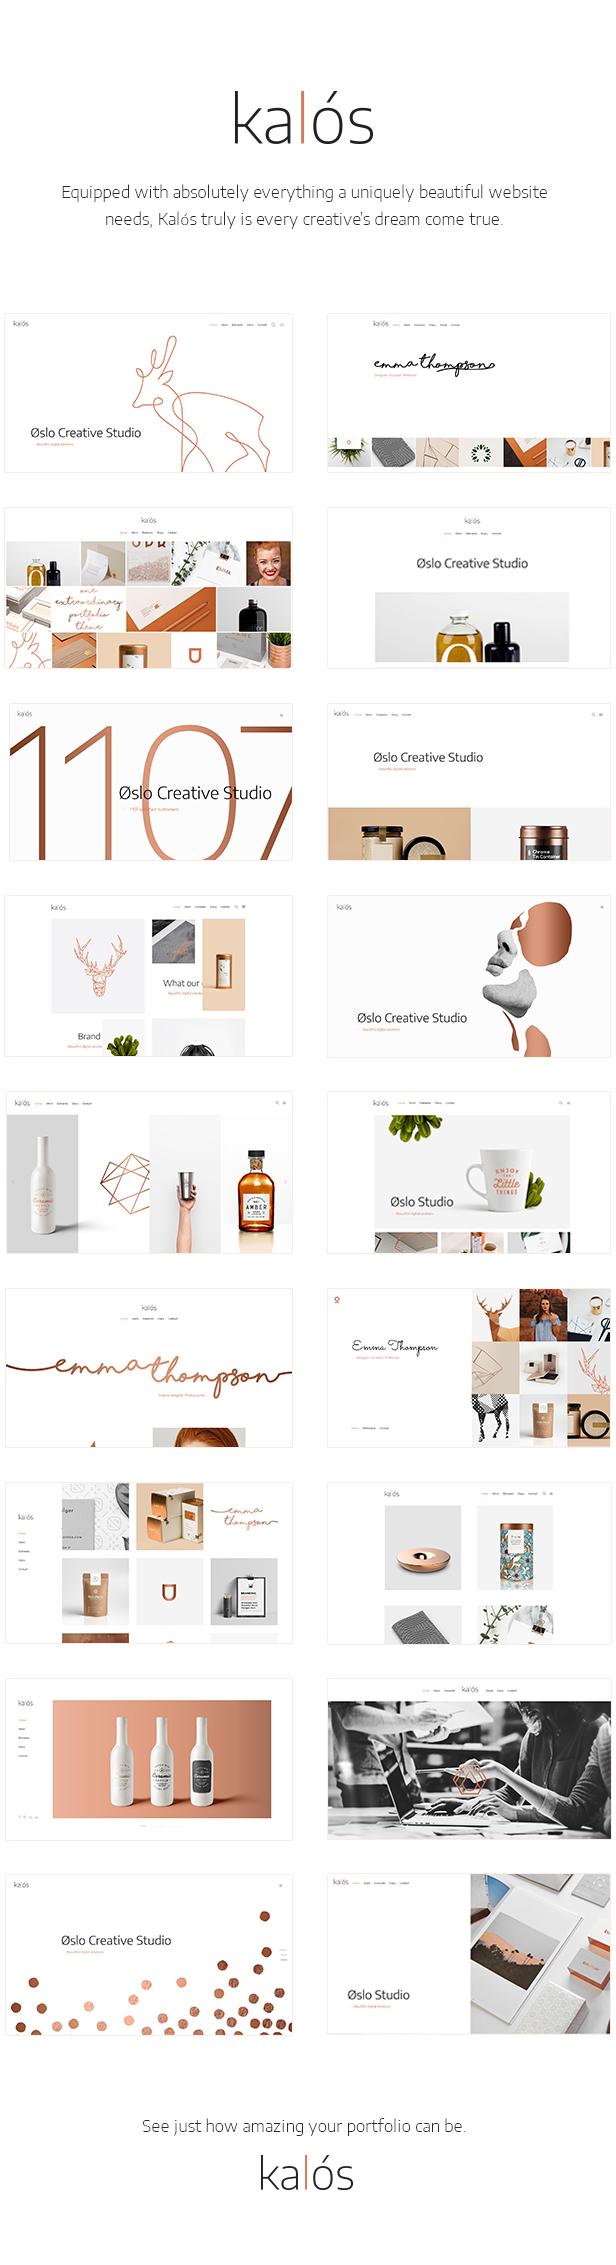 Kalόs - A Clean Multi-Concept Portfolio Theme - 1